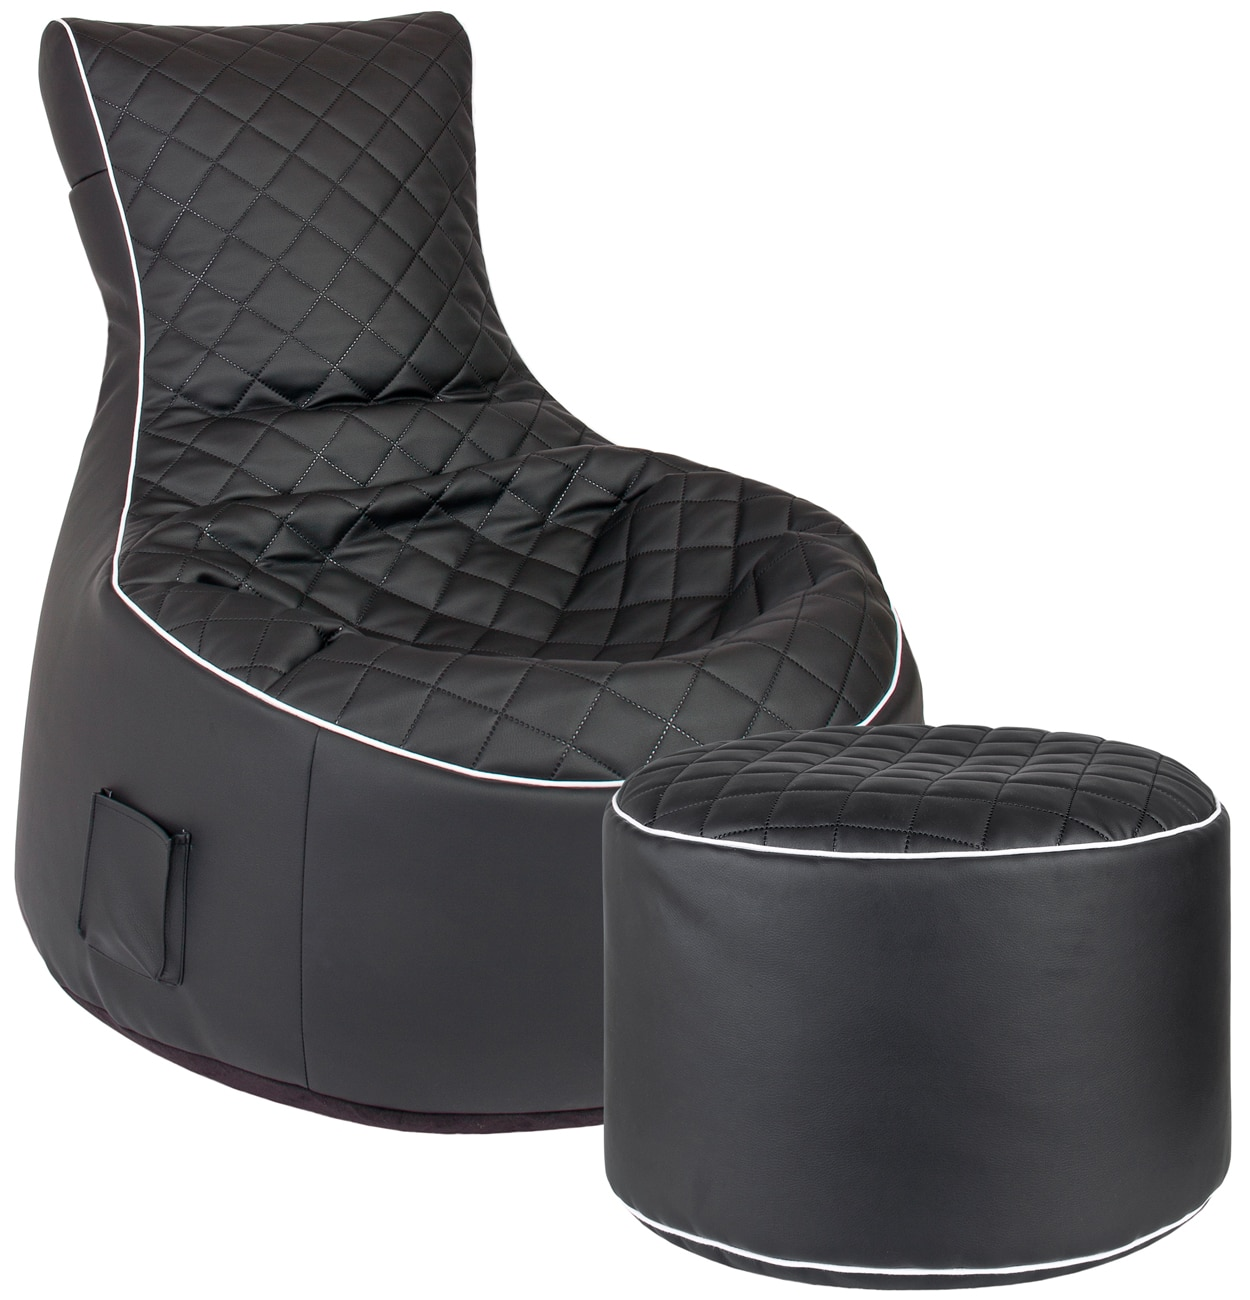 V a gez gez een zwarte chill stoel zitzak for Chill stoel